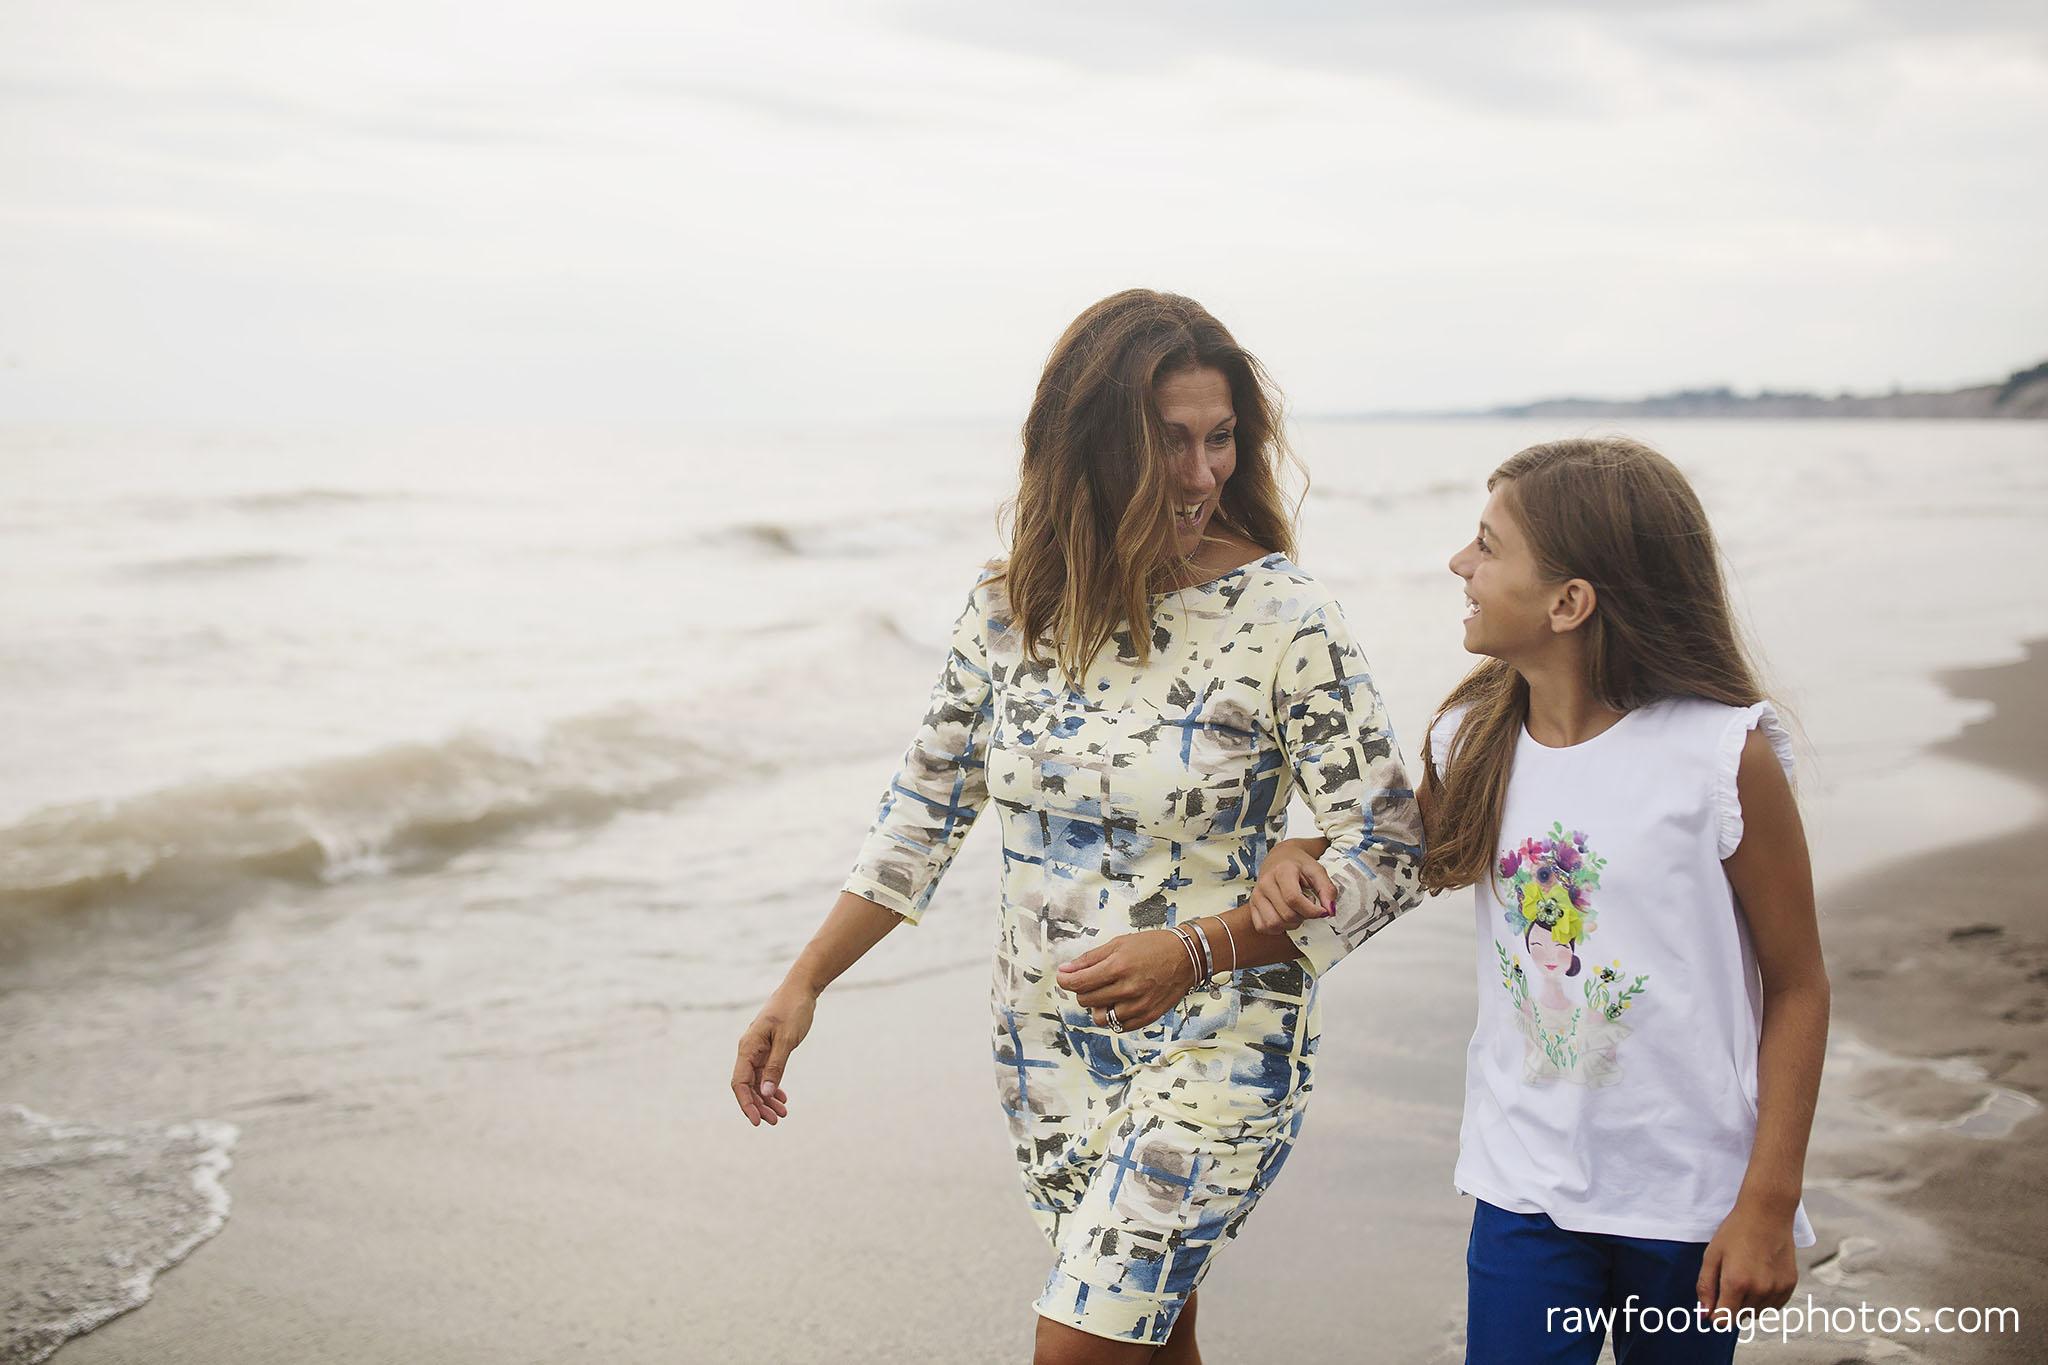 London_ontario_family_photographer_beach_photos010_1.jpg